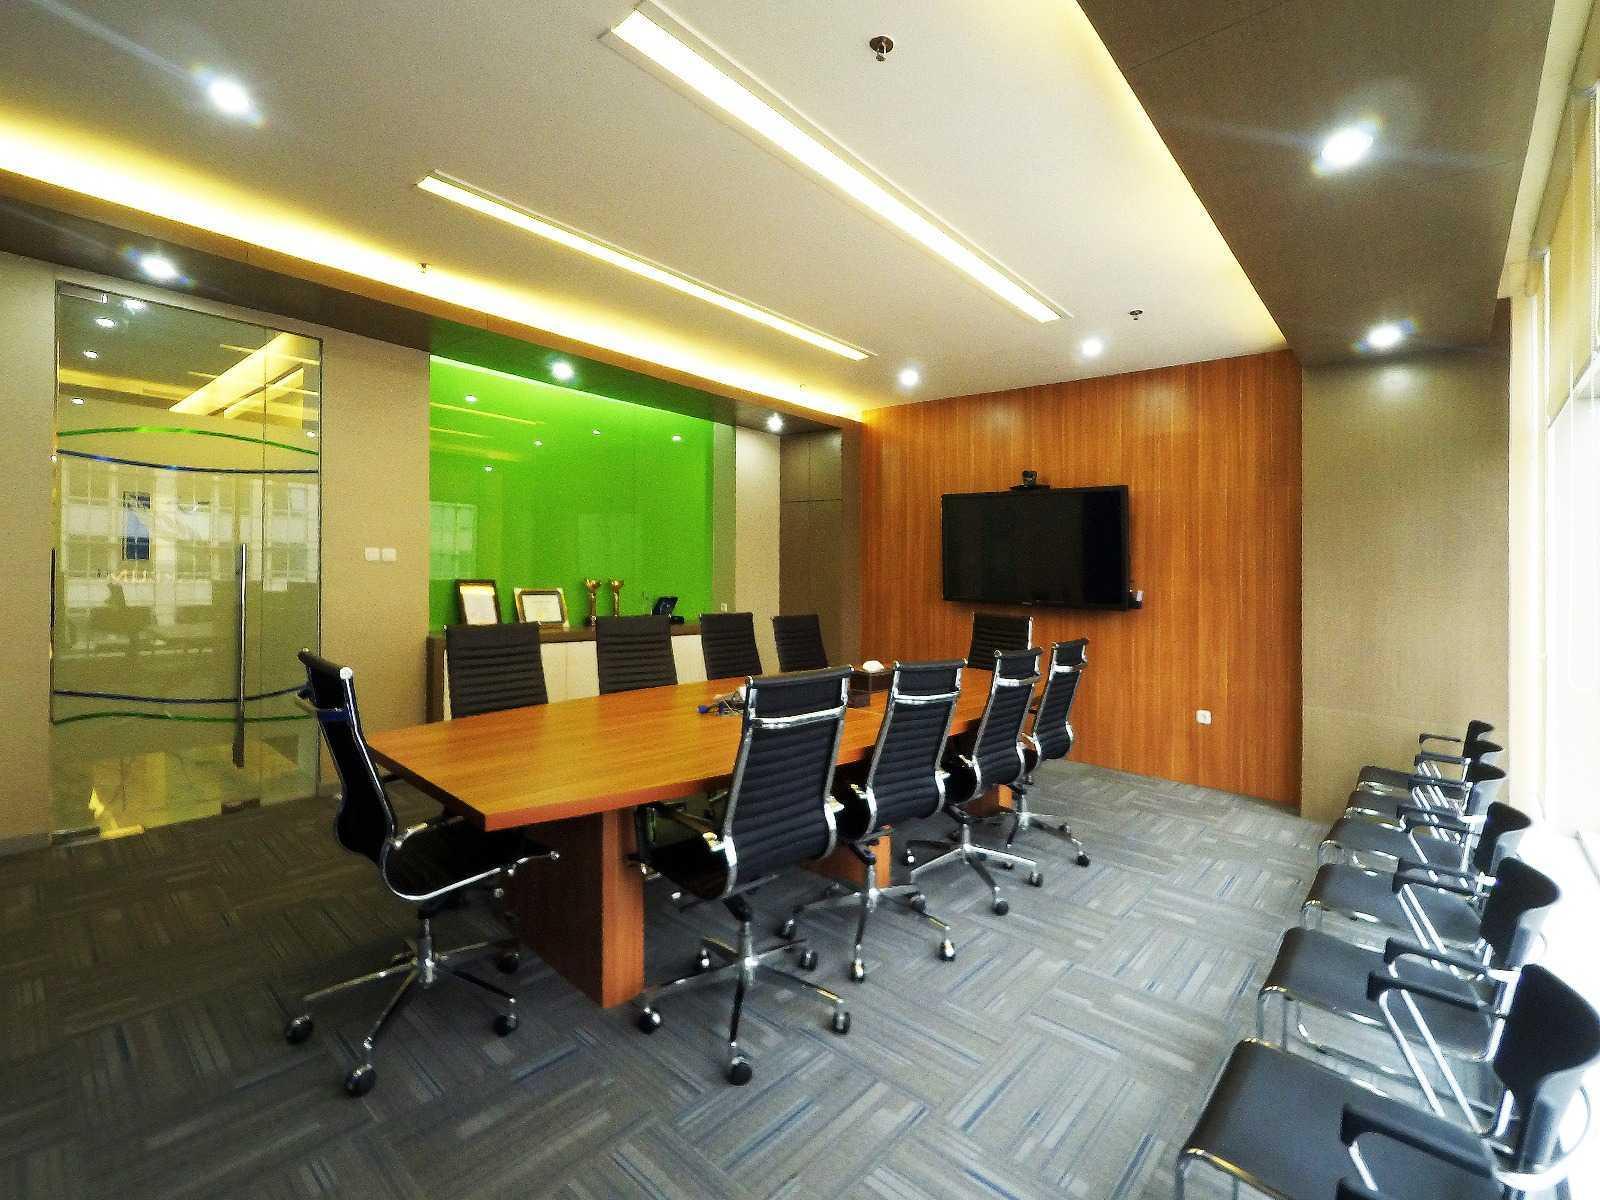 Arkadia Works Sekar Bumi Office Renovation Plaza Asia 21St Floor Plaza Asia 21St Floor Meeting Room   14076